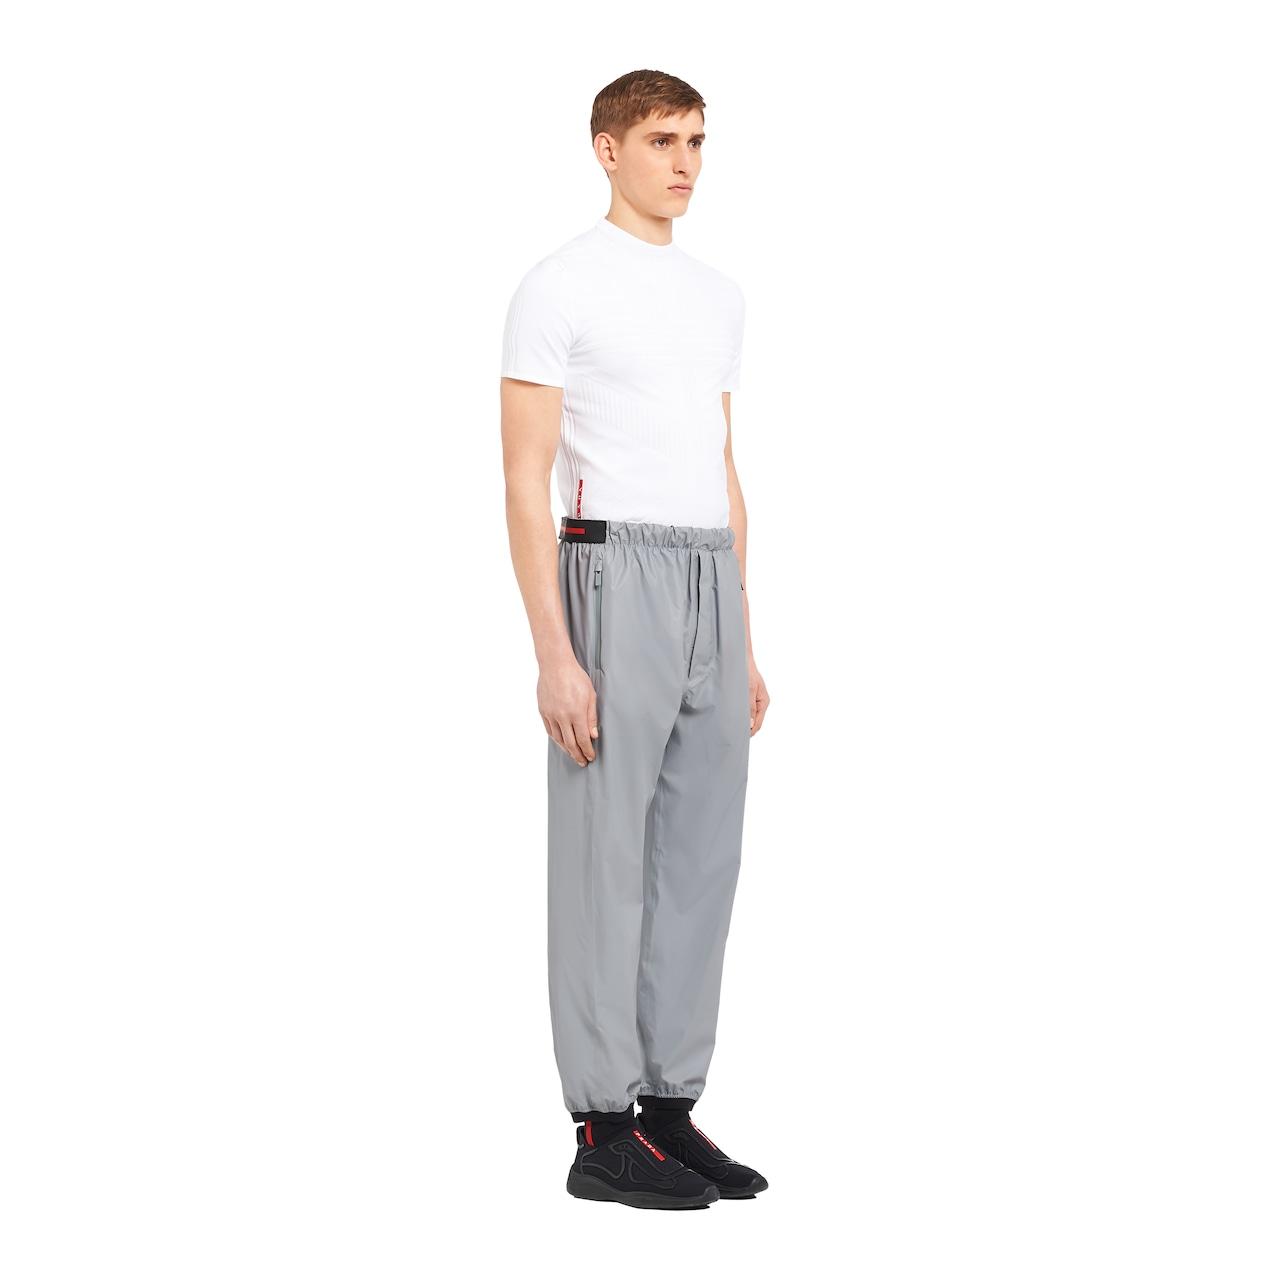 Prada 尼龙长裤 LR-LX007 3